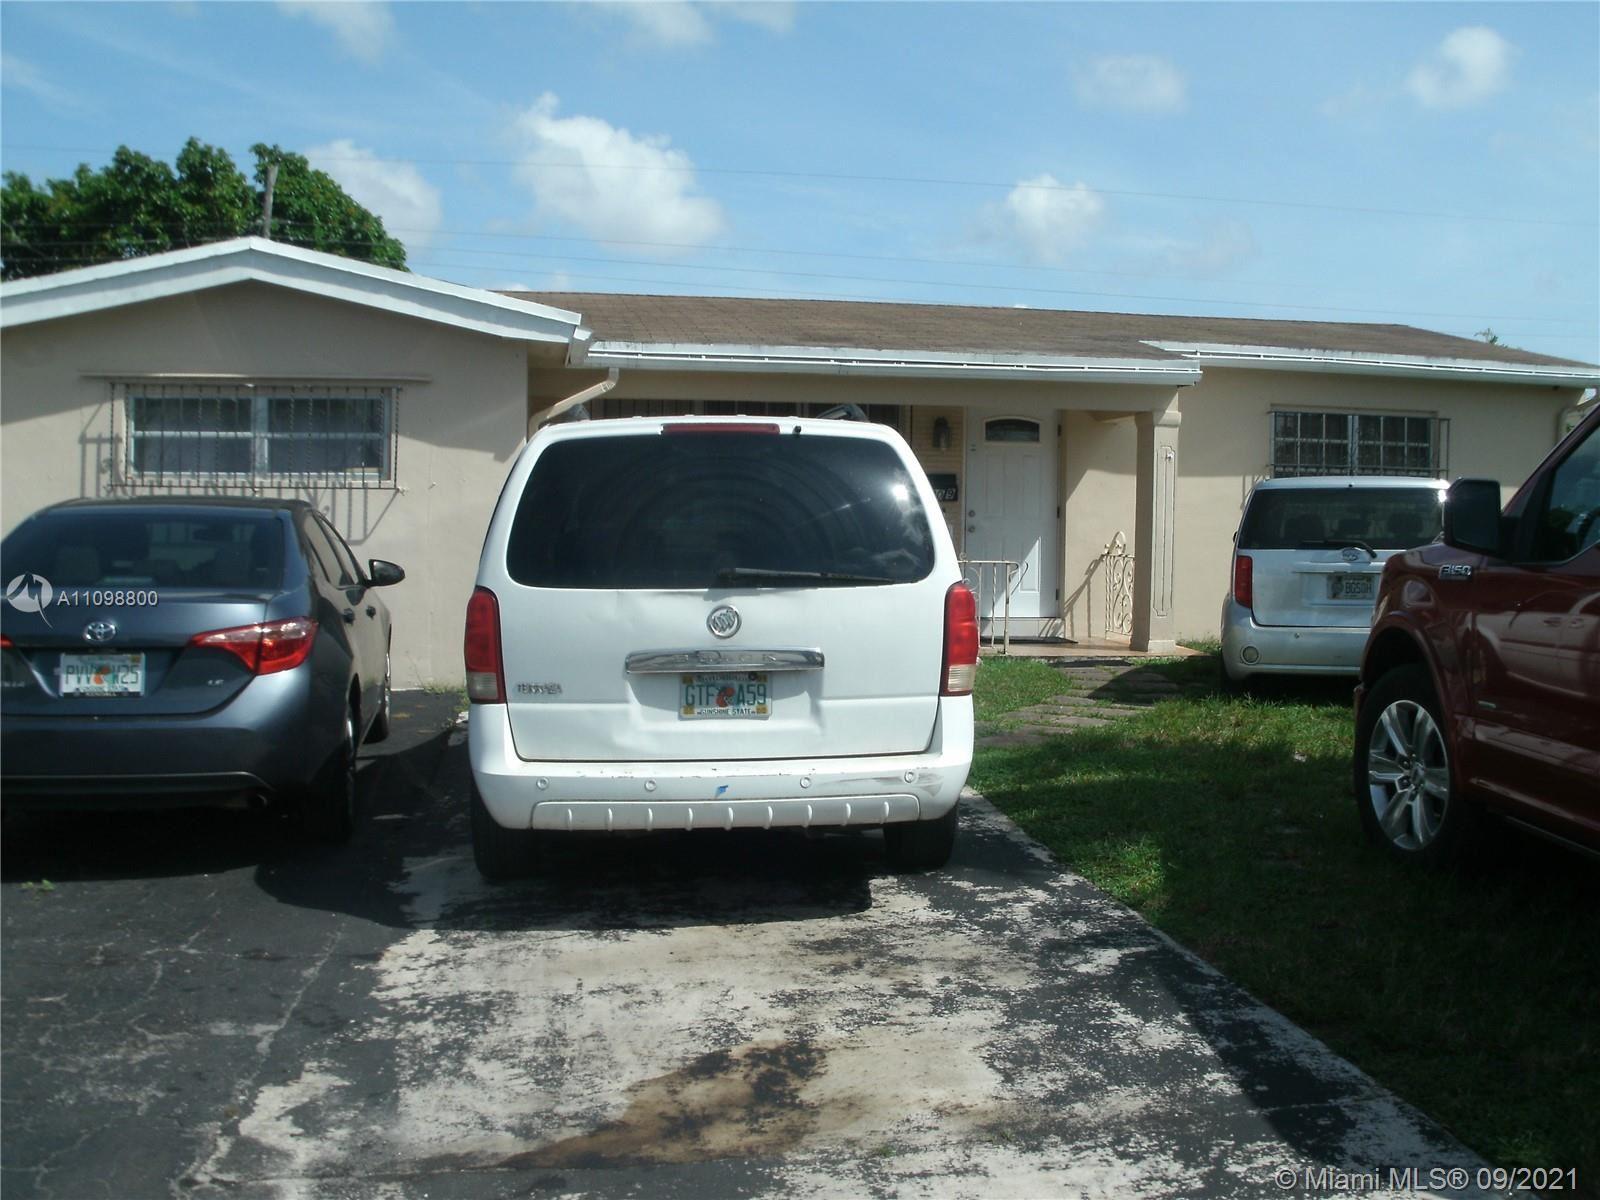 7909 Juniper St, Miramar, FL 33023 - #: A11098800